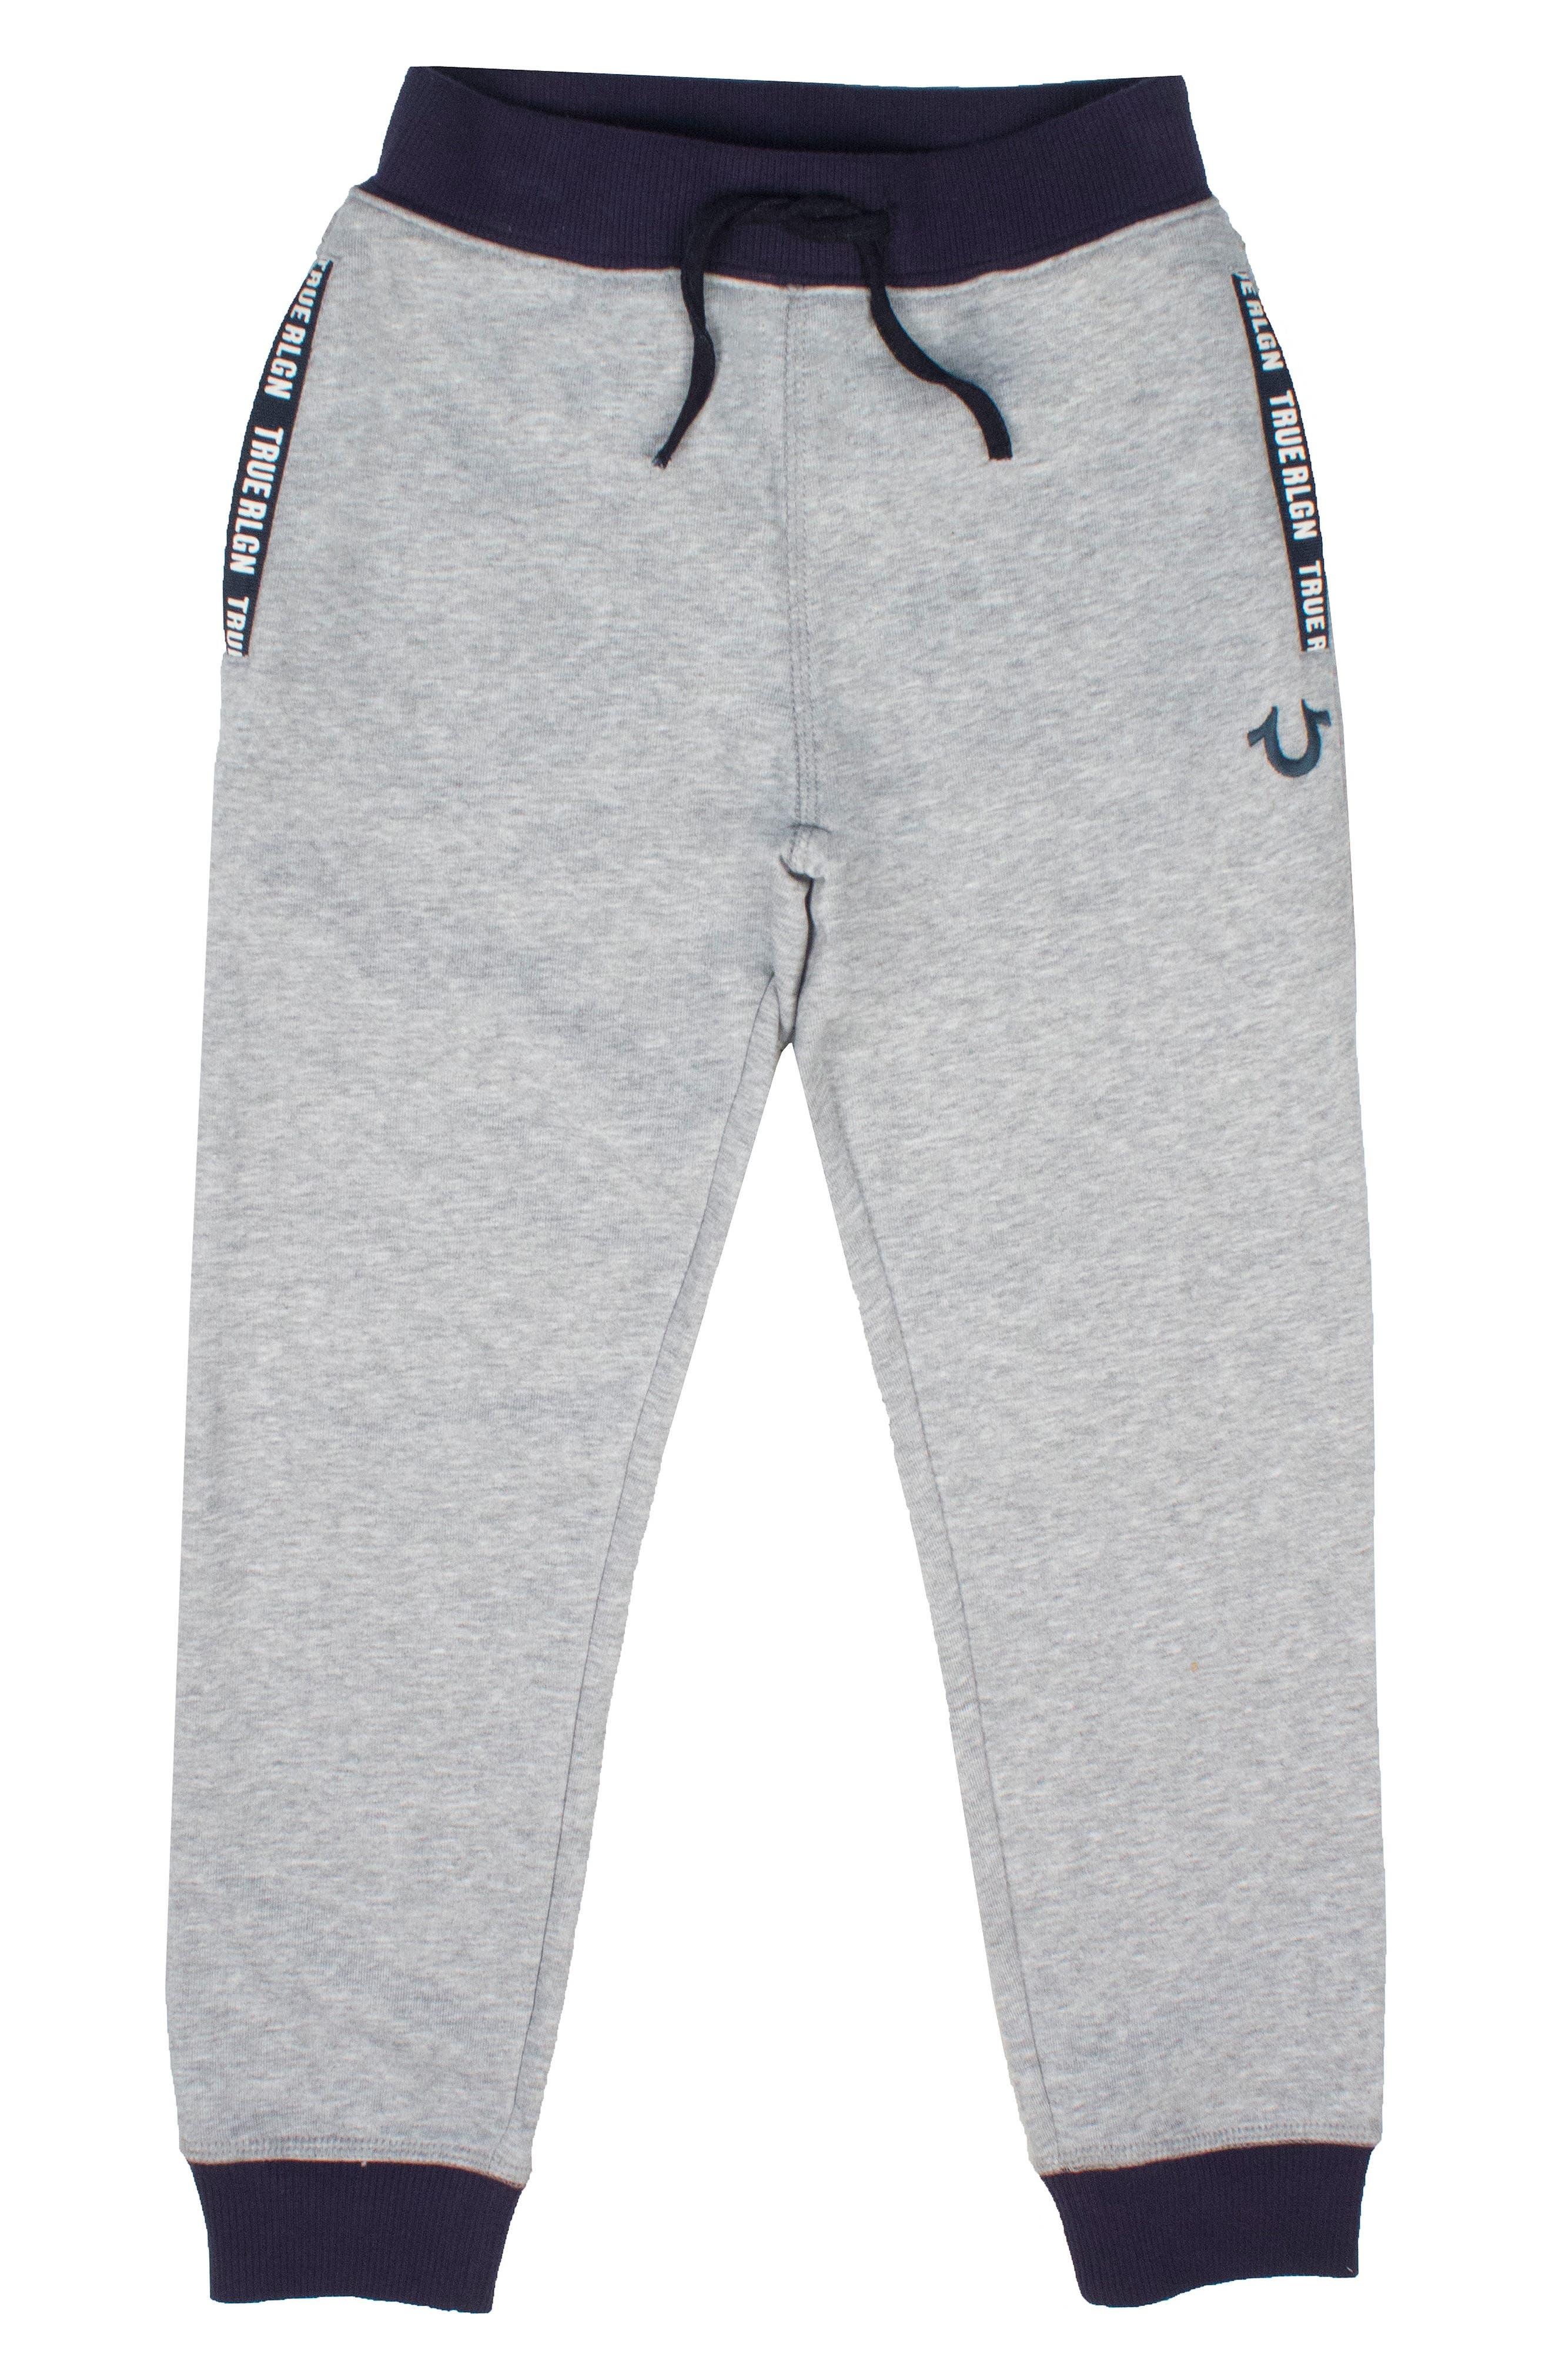 Tape Sweatpants,                         Main,                         color, 091